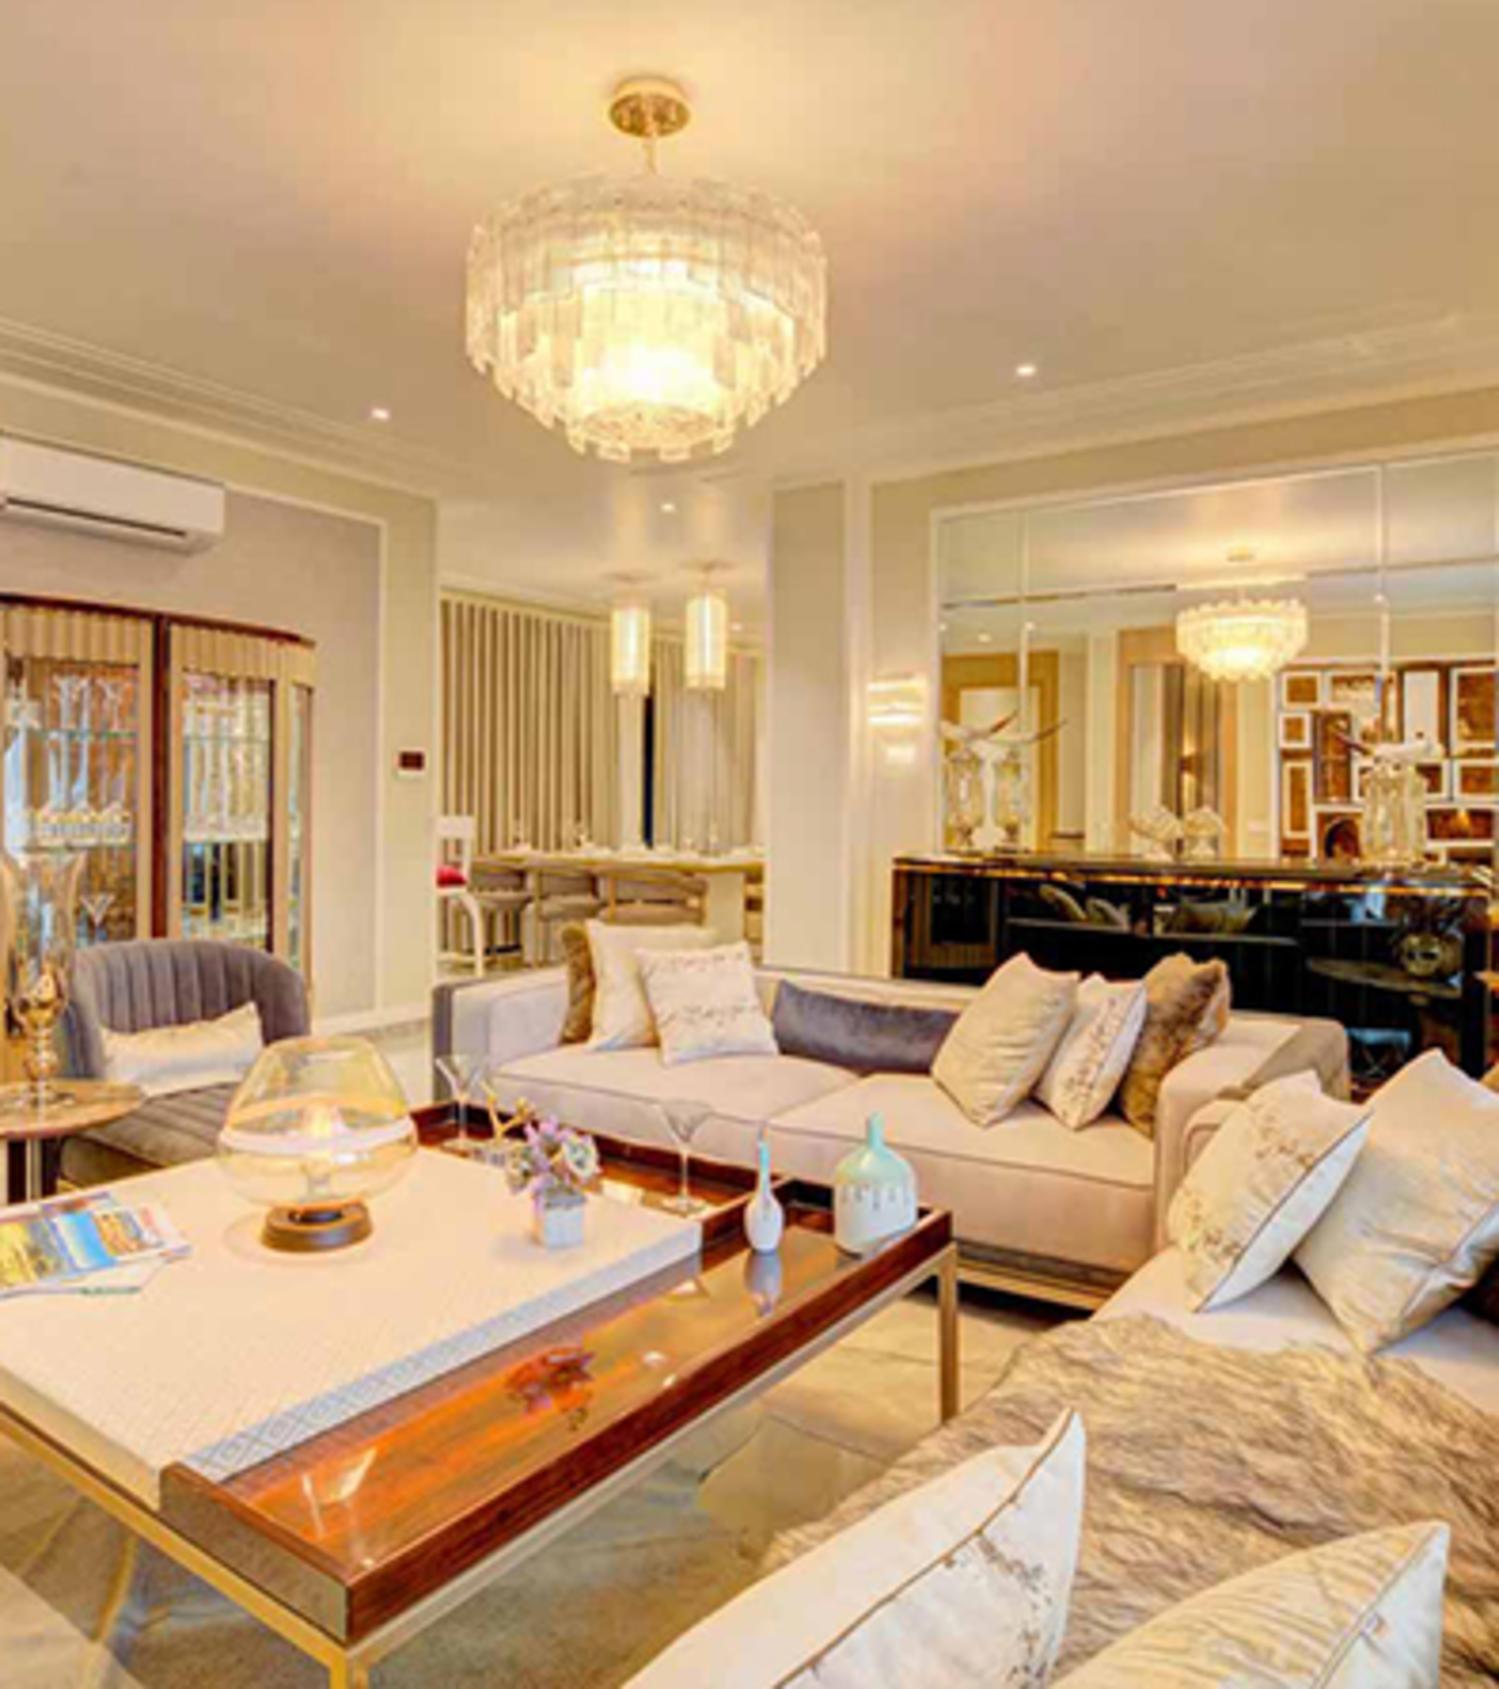 Themarbellagrandmohali - Real Estate Company in Mohali